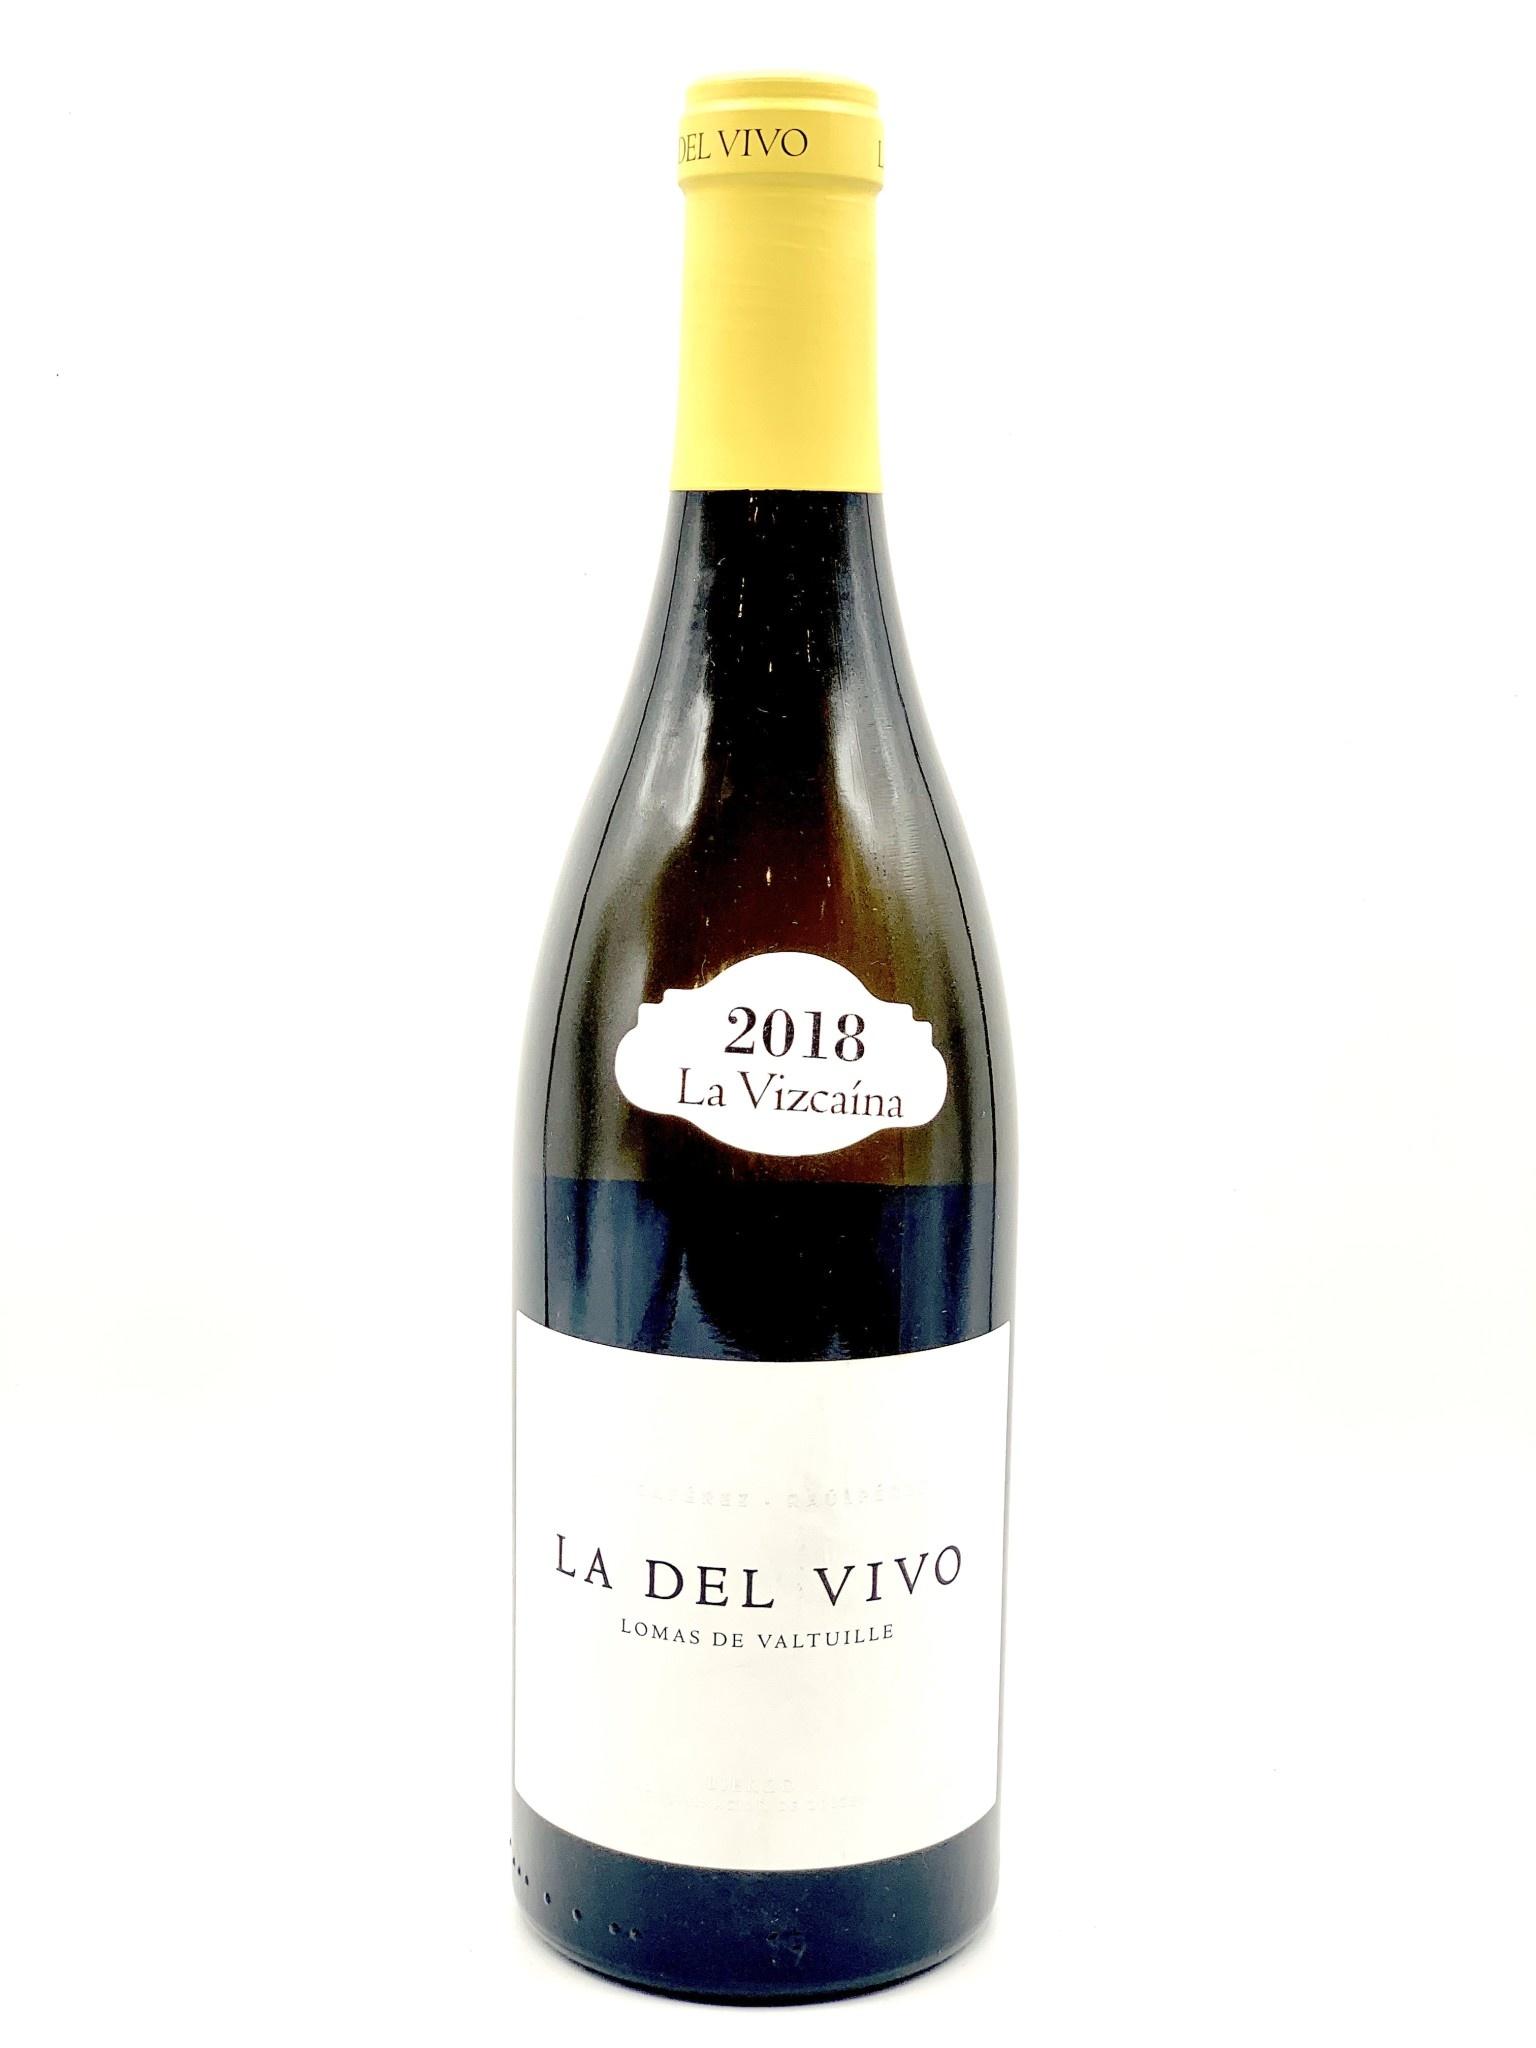 Bierzo La Del Vivo Bianco 2018 La Vizcaina by Raul Perez  750ml